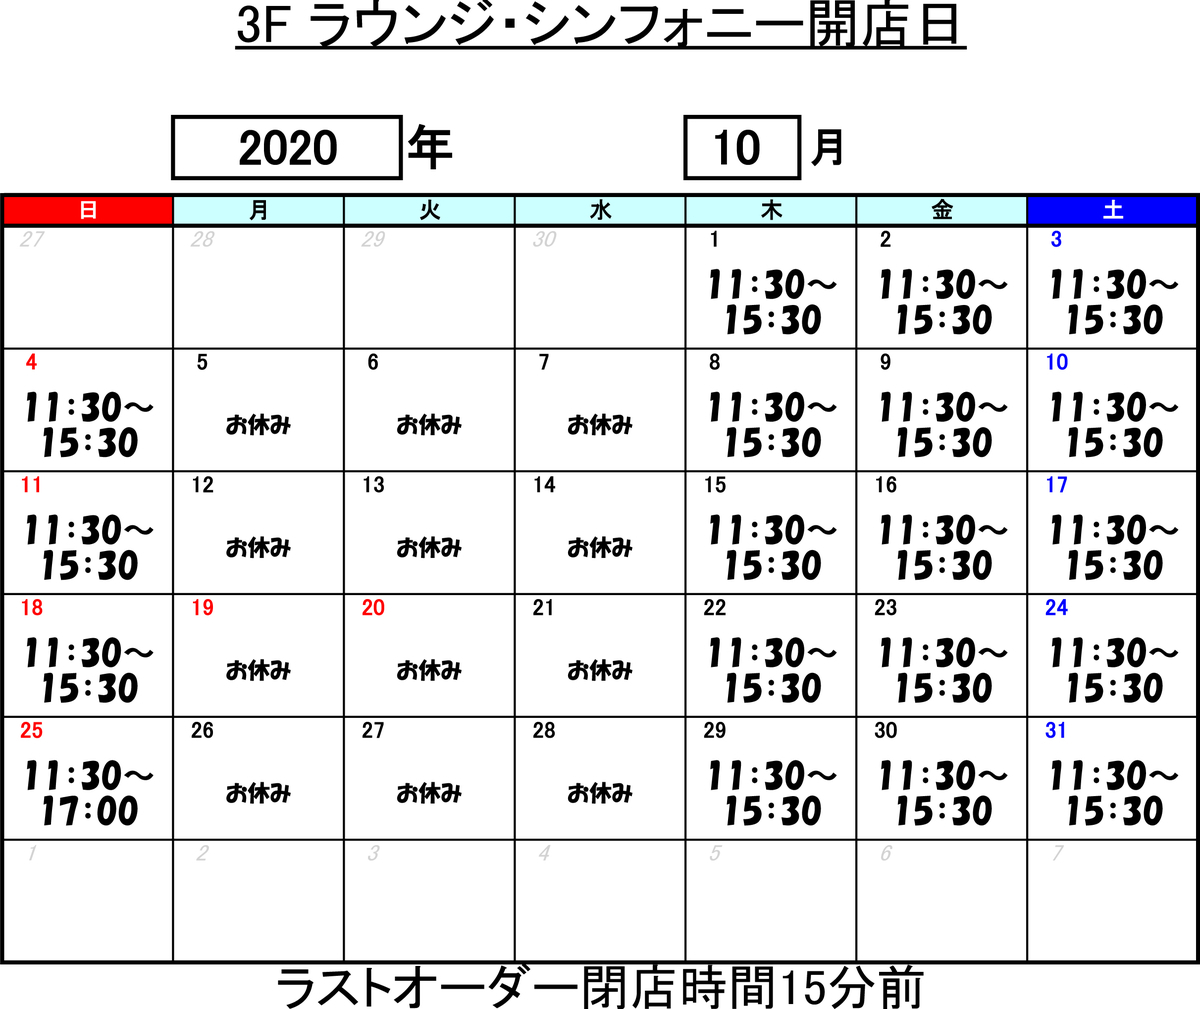 f:id:symphony2019:20201002134921j:plain